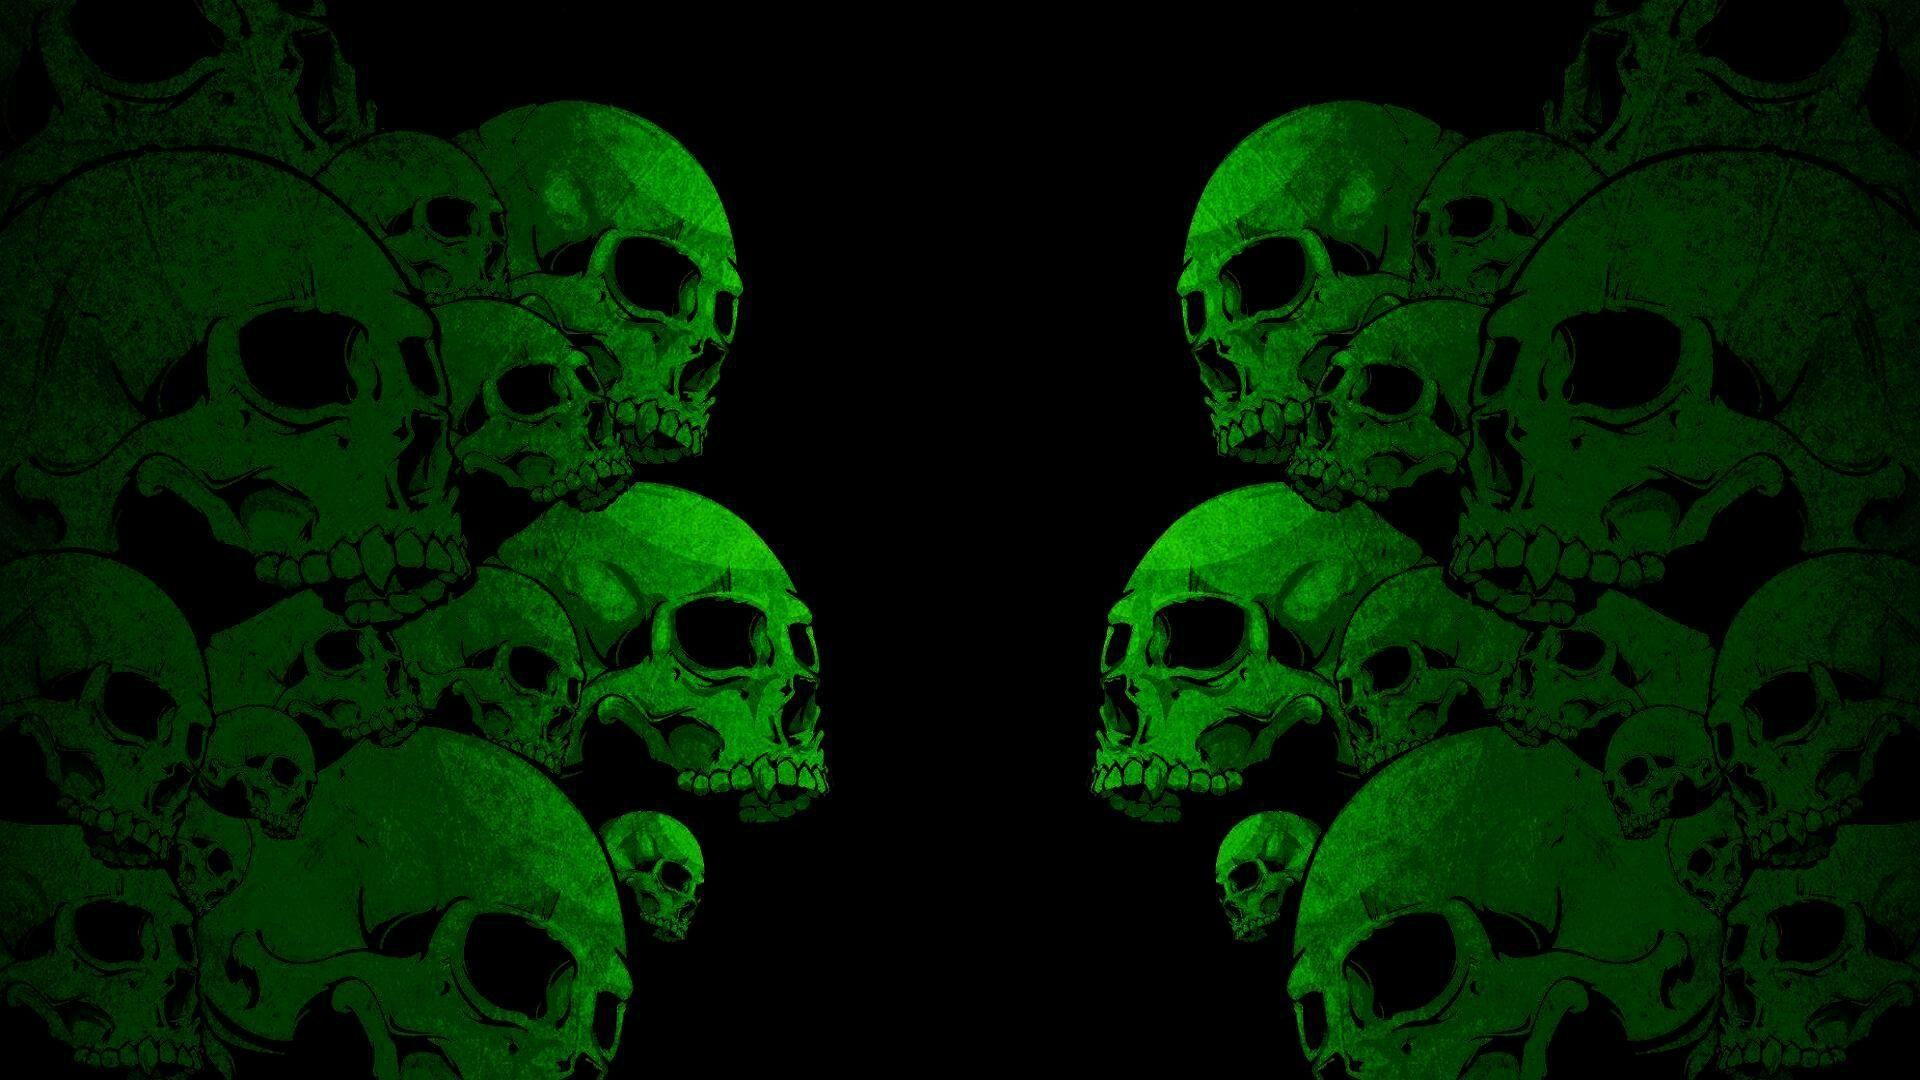 Pin By Stewart Arnott On Fairing Vinyl Wrap Ideas Skull Wallpaper Skull Painting Iphone Wallpaper Green